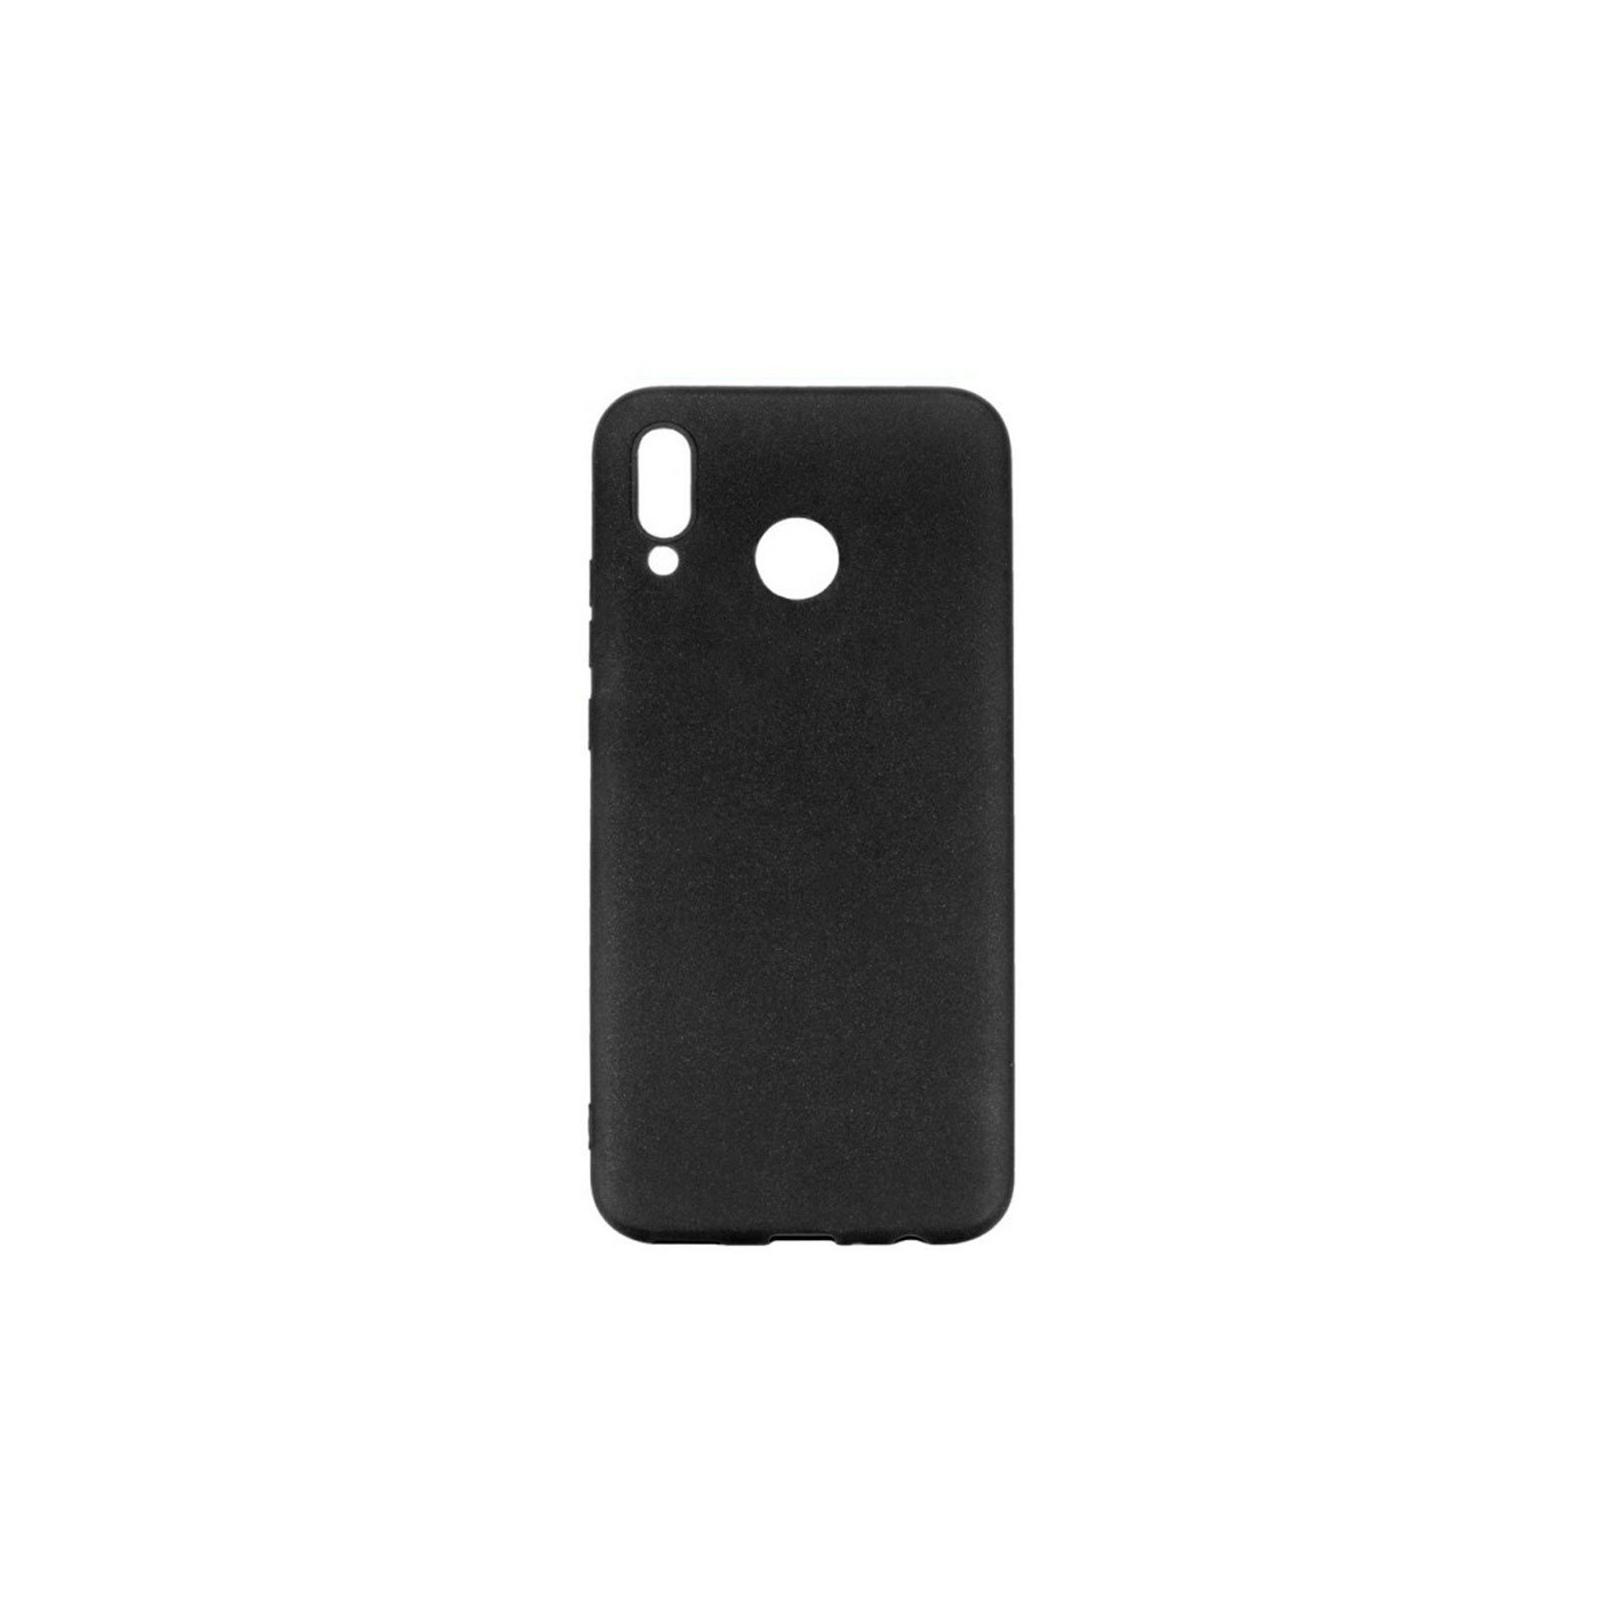 Чехол для моб. телефона ColorWay ColorWay TPU matt для Samsung Galaxy A30 Black (CW-CTMSGA305-BK)